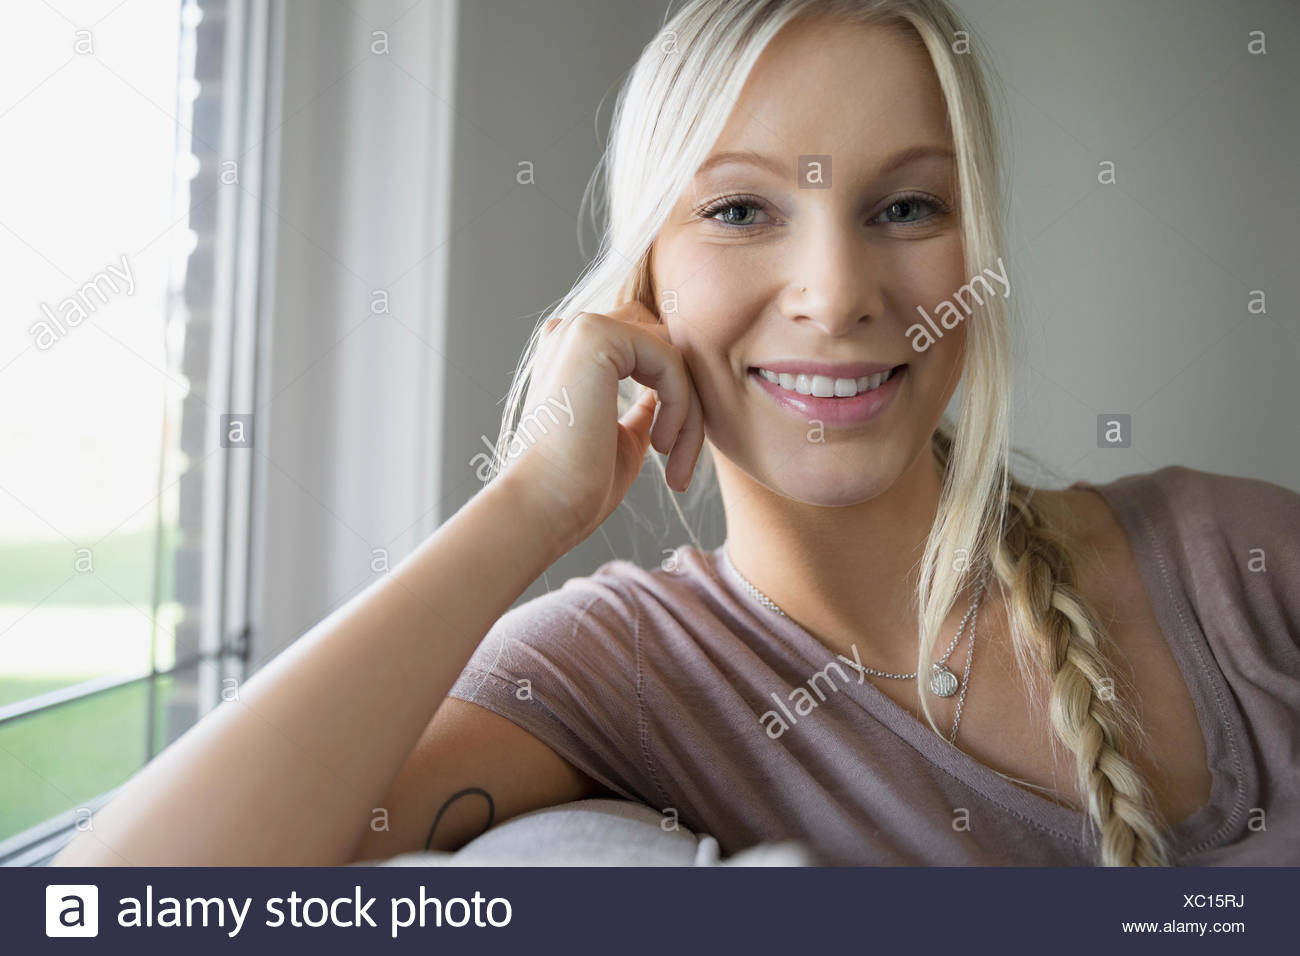 Porträt lächelnde blonde junge Frau Stockbild